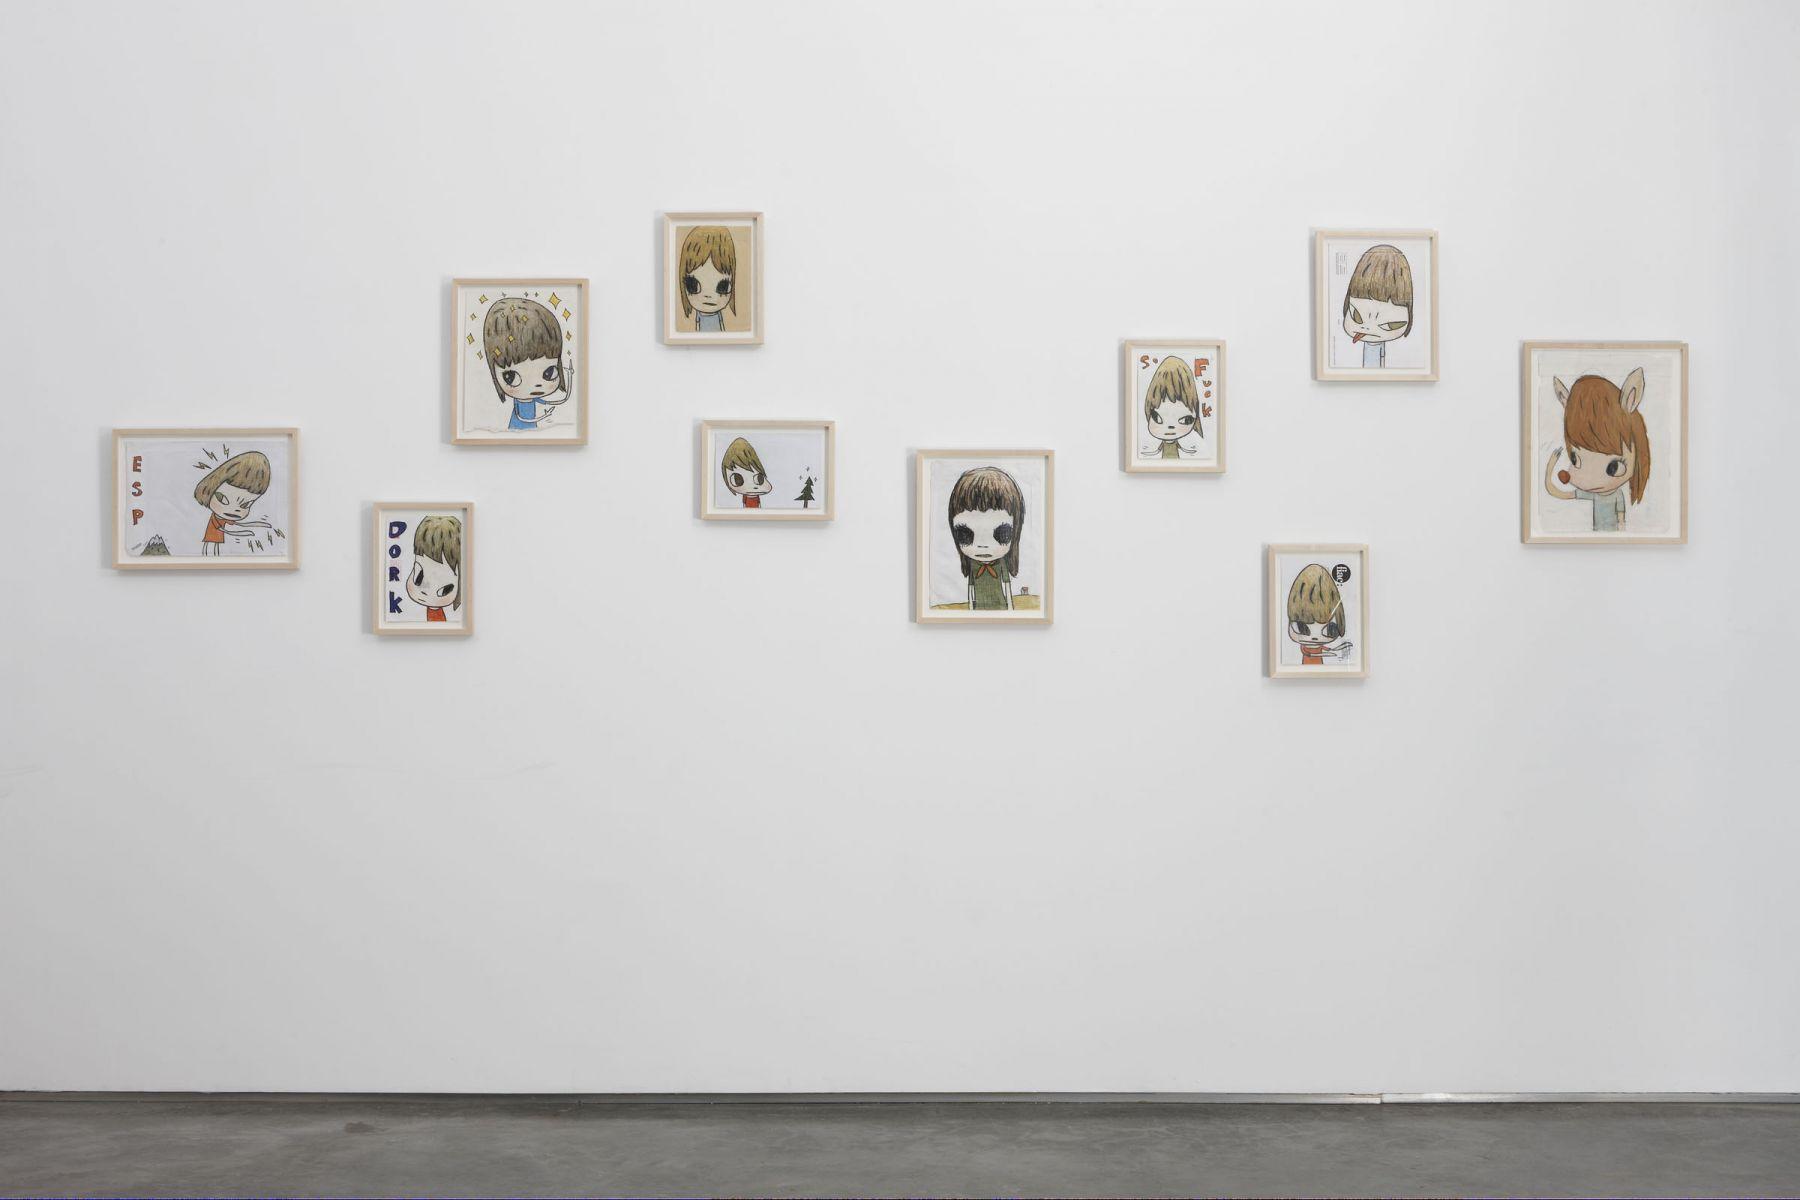 Installation View, Marianne Boesky Gallery, 2009